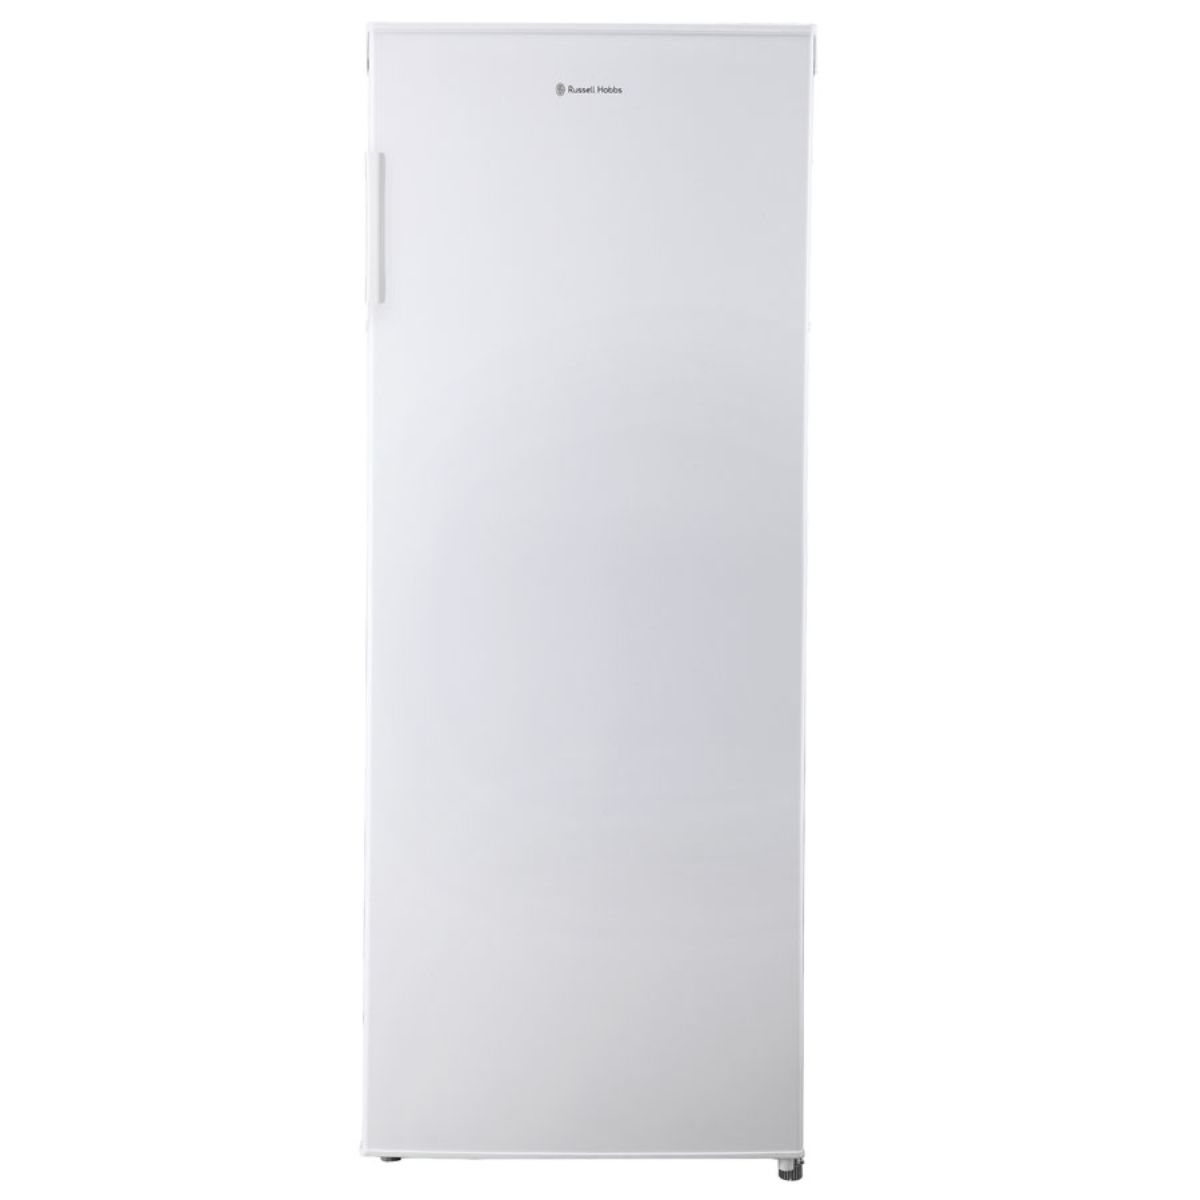 Russell Hobbs RH55FZ142 157L Upright Freezer - White